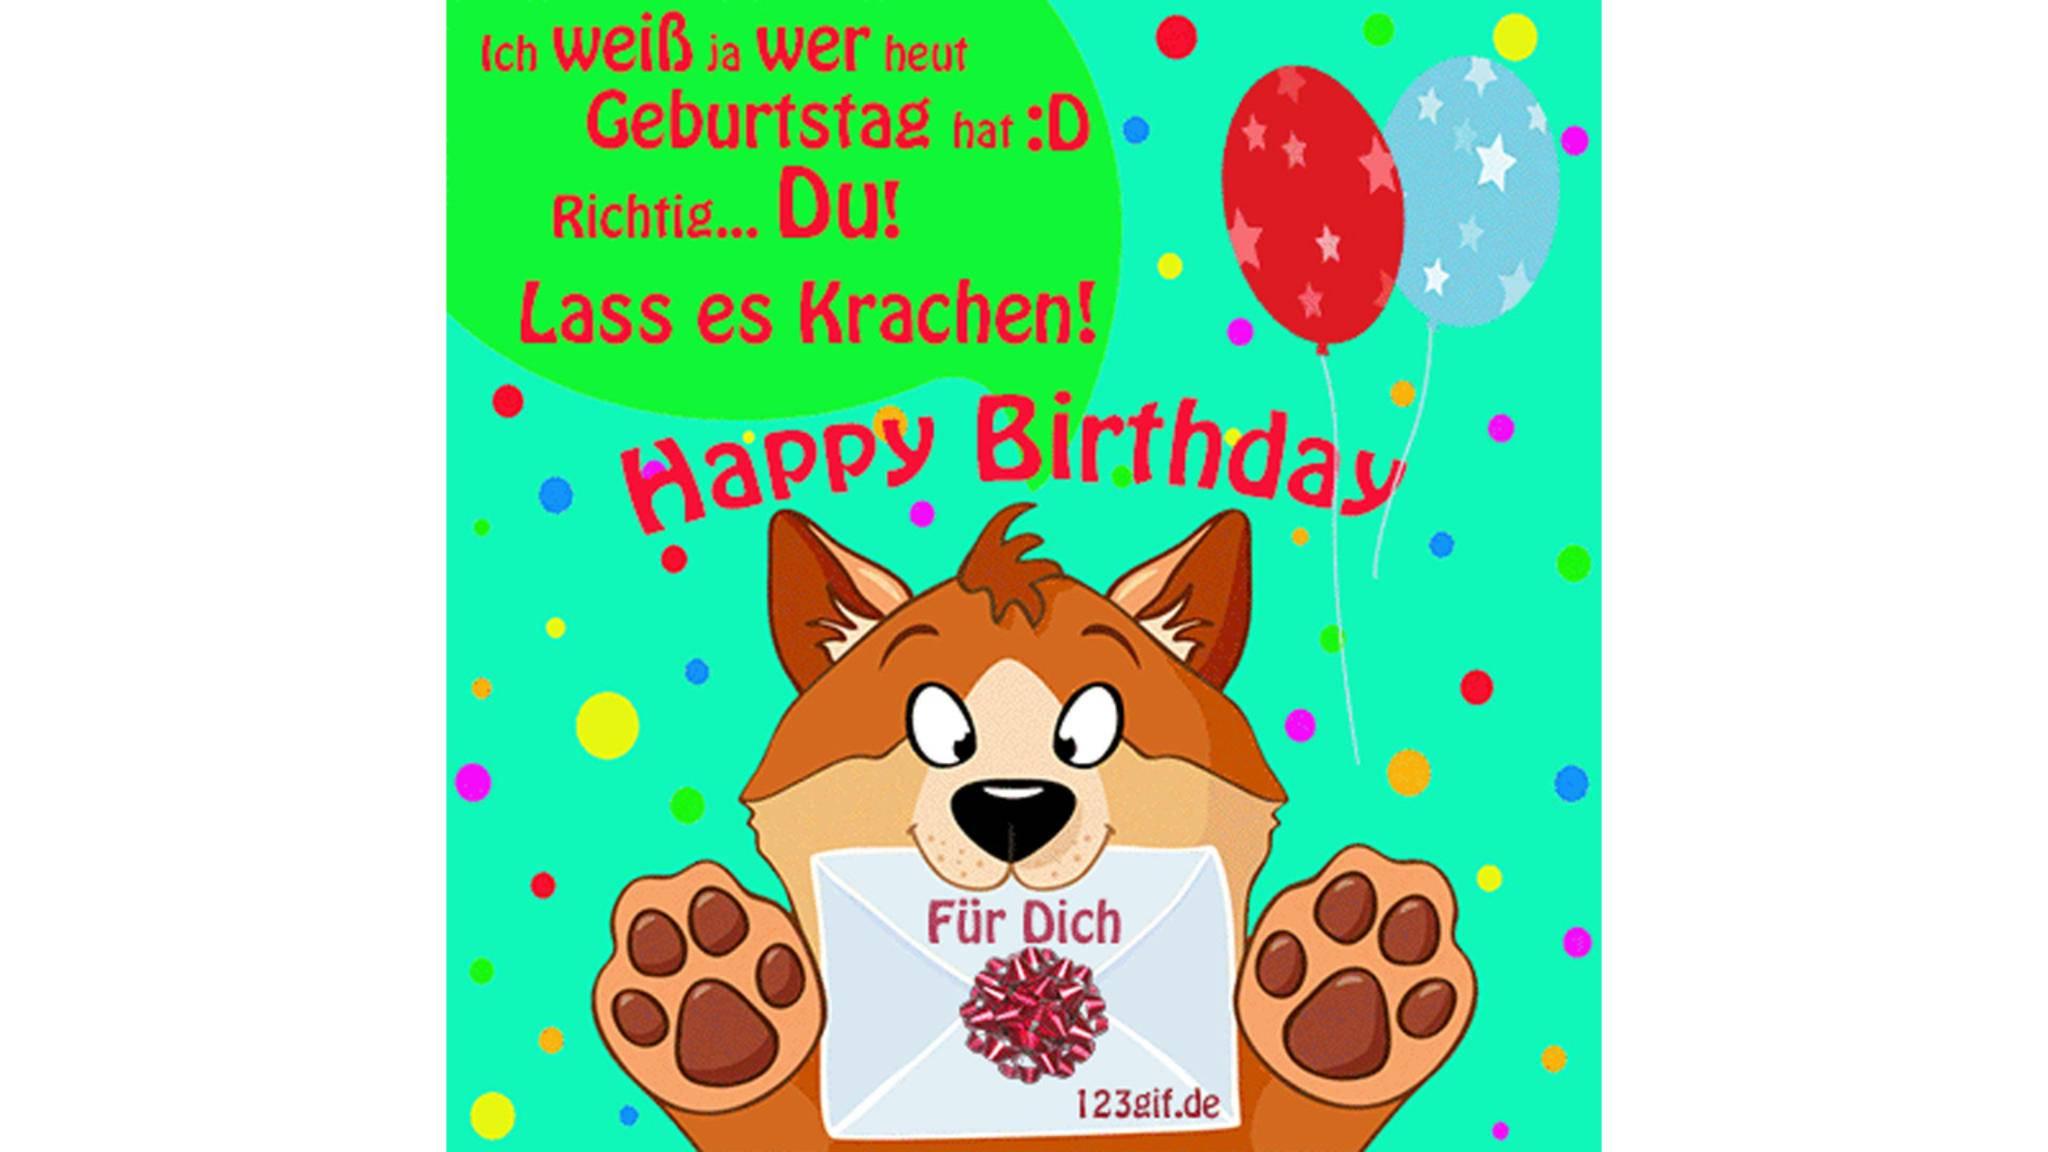 Geburtstag Whatsapp Bilder